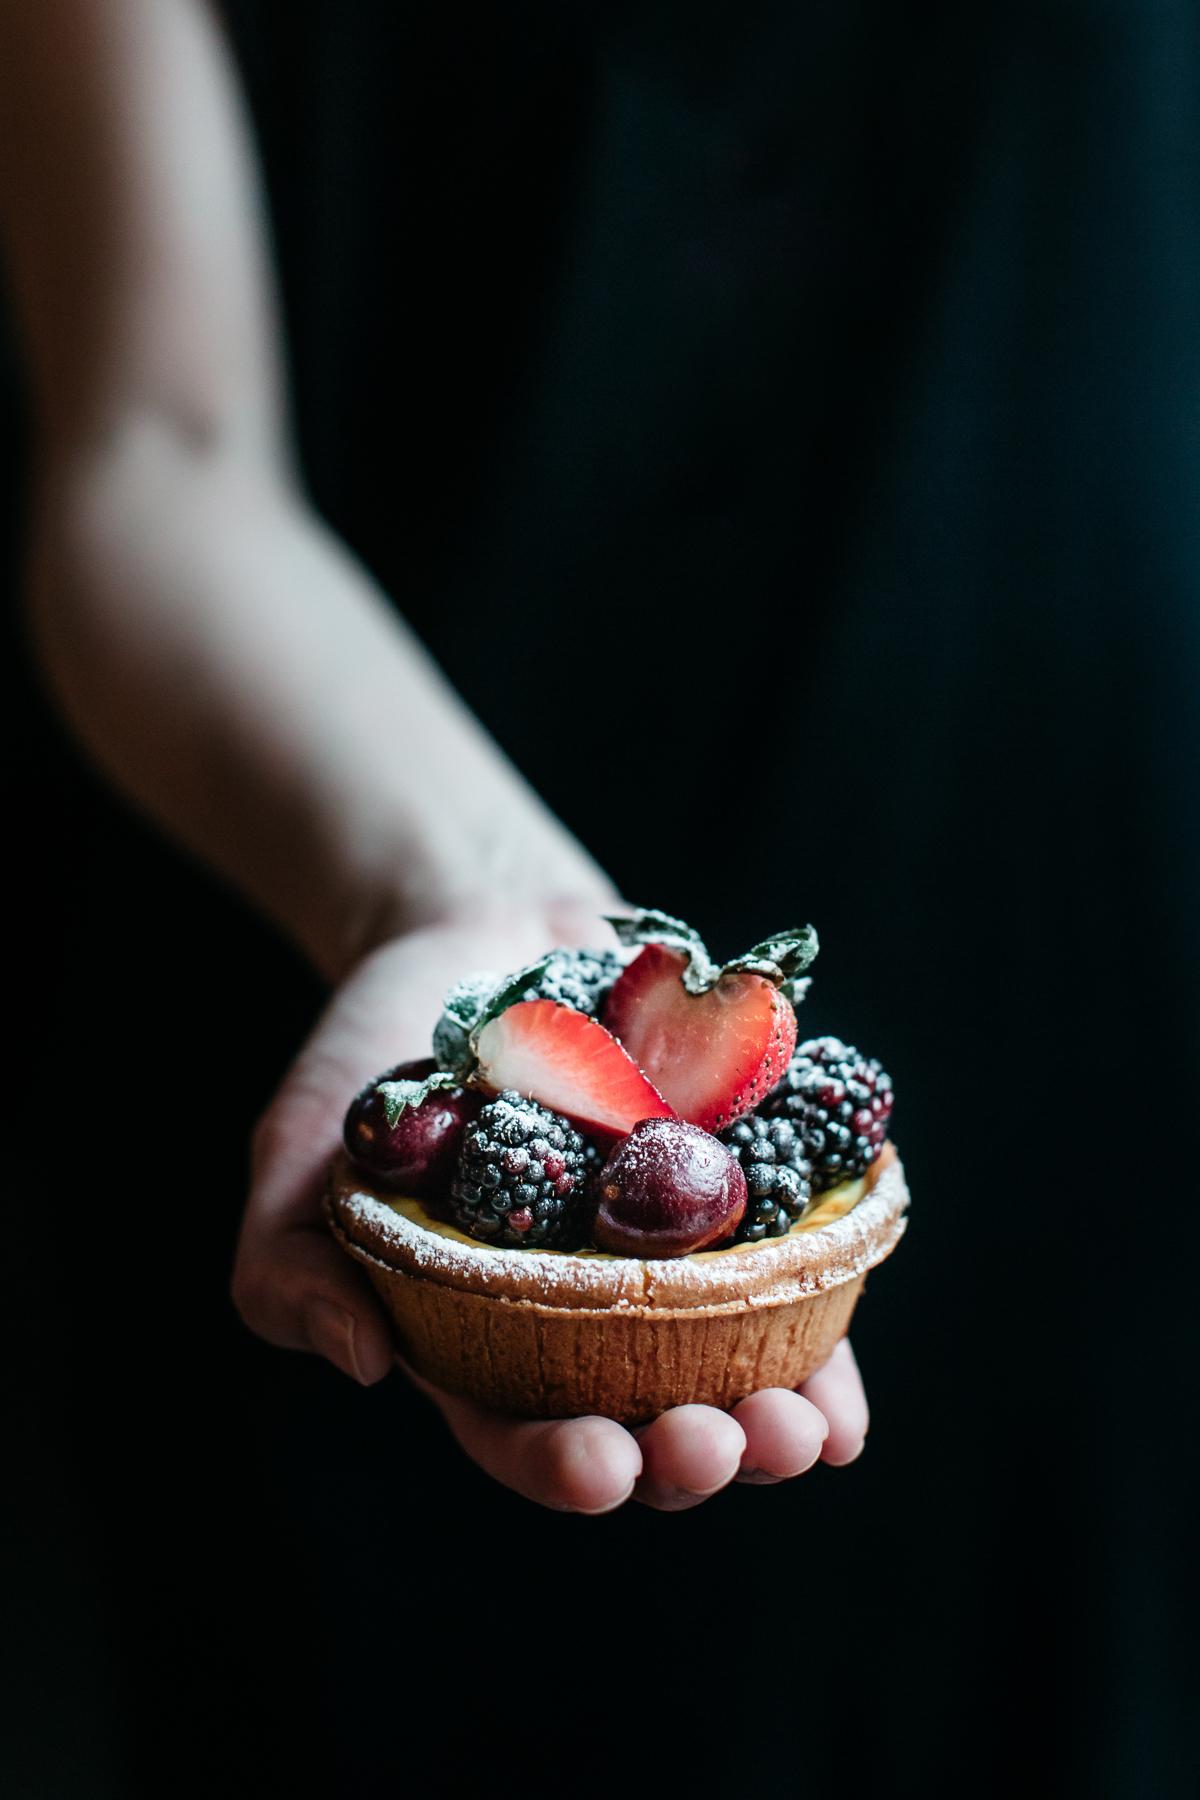 sm-food-dark-8.jpg